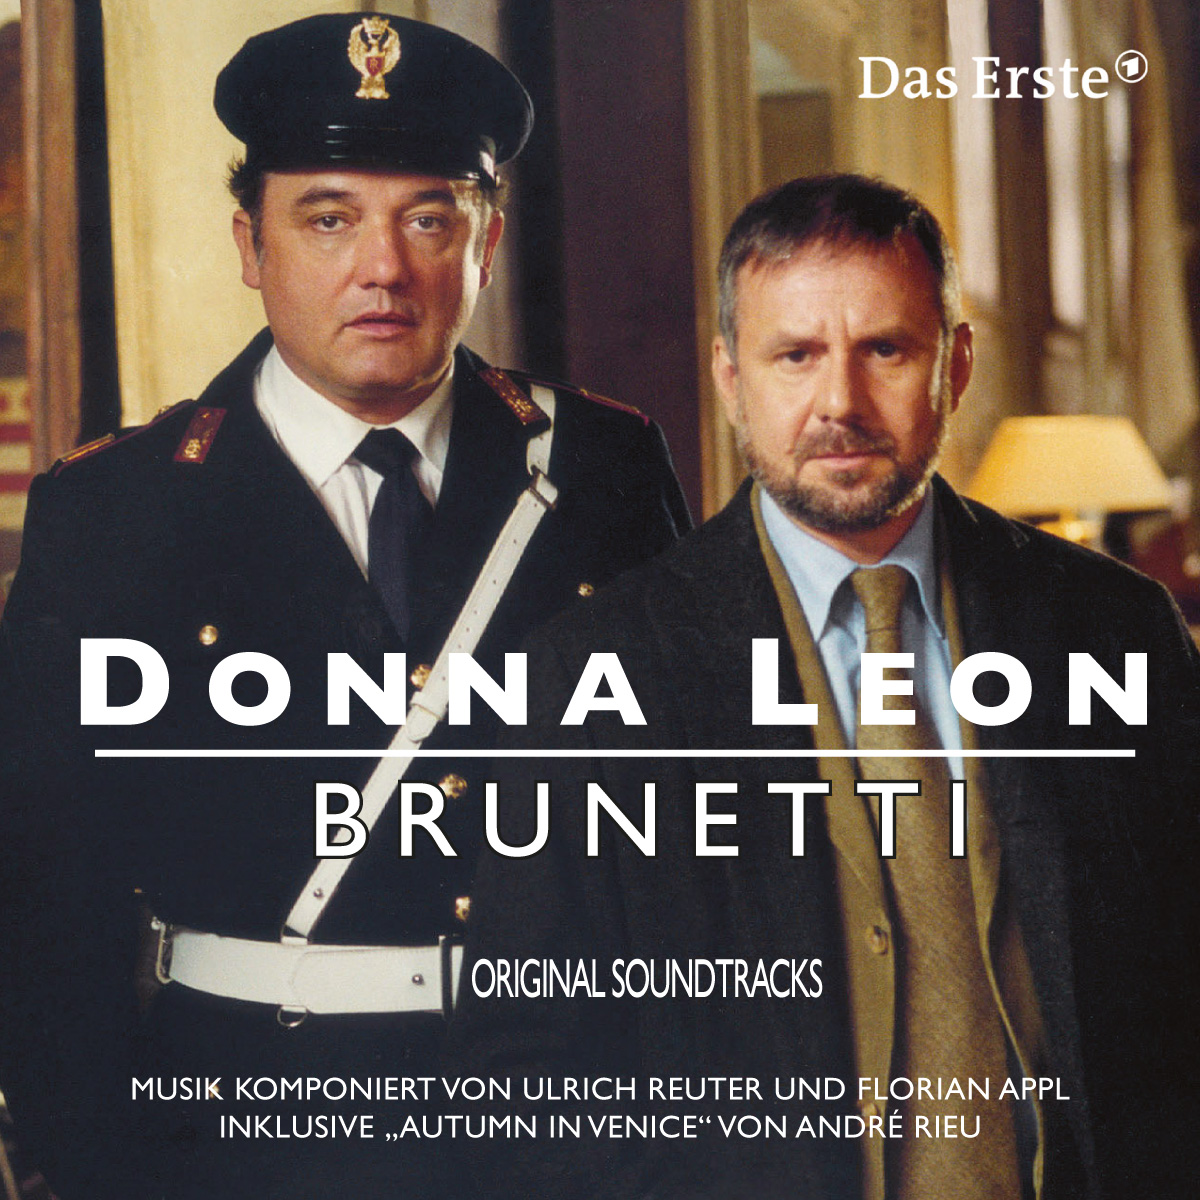 Brunetti Donna Leon